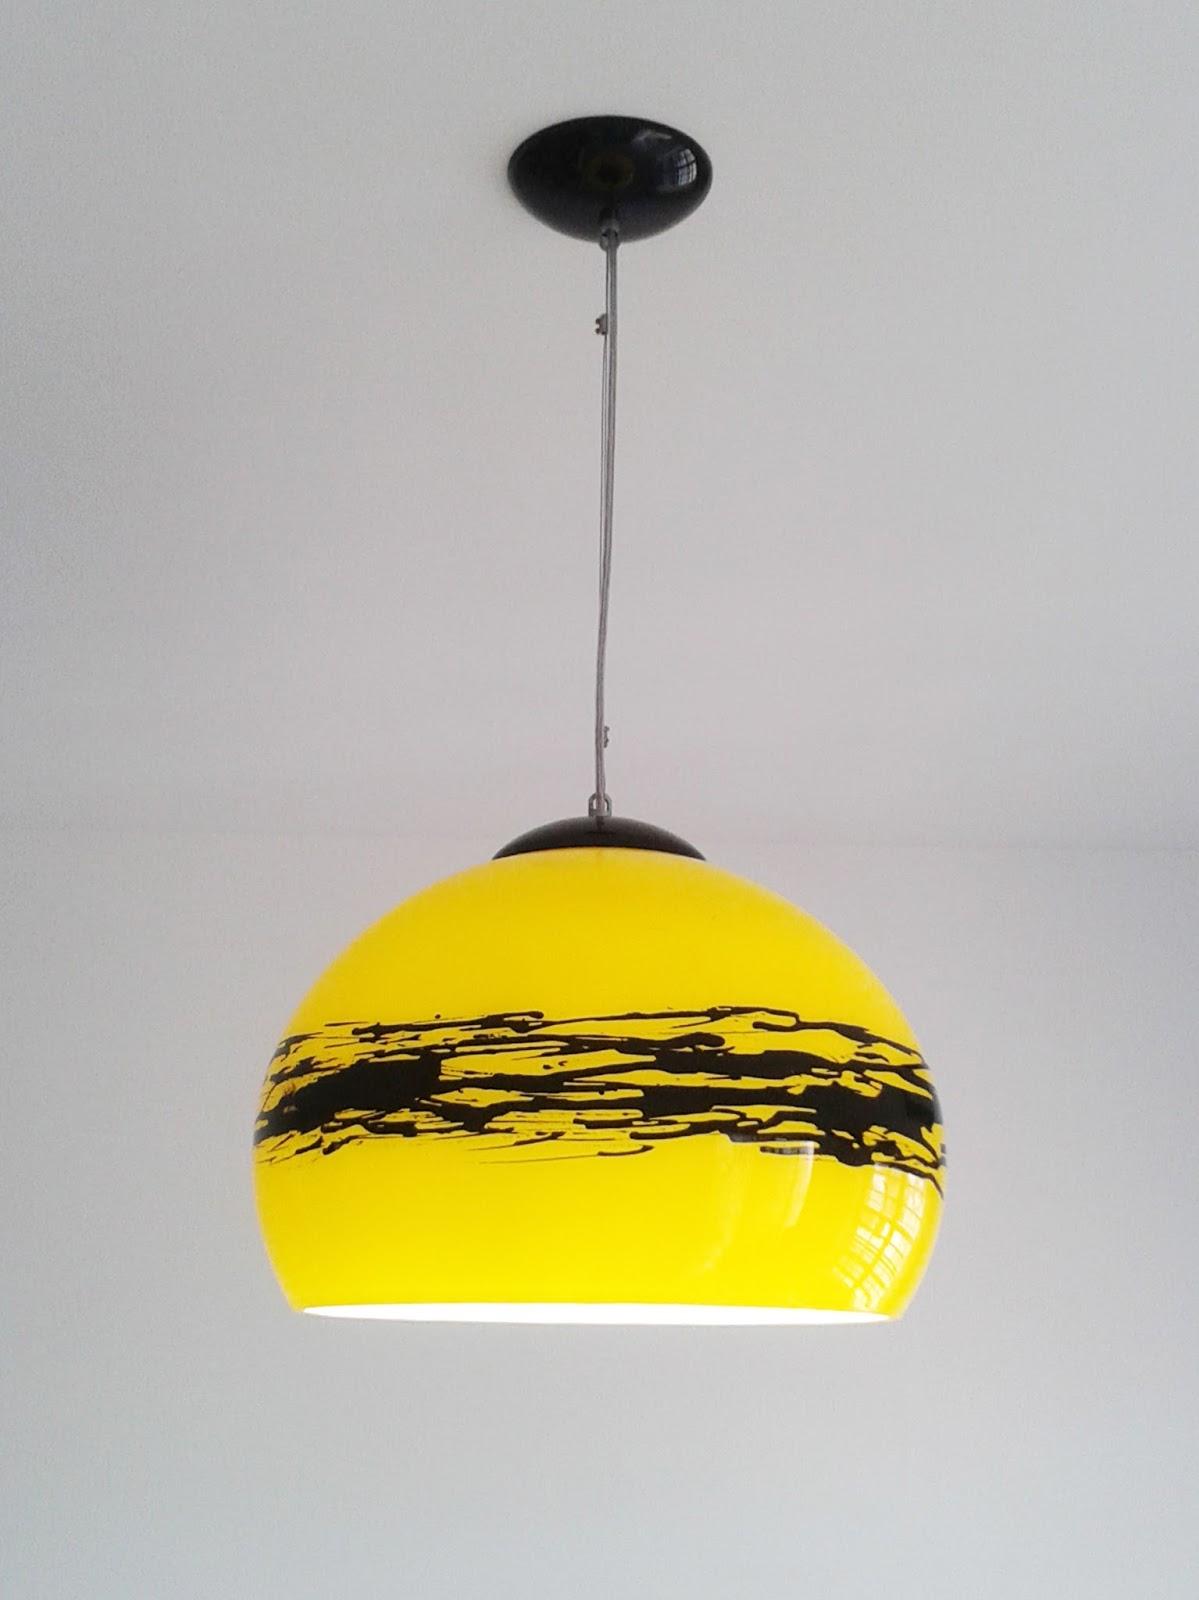 publicado por ludica iluminacion lamparas de diseo de techo colgantes modernas diseo decoracion interiores hogar living comedor cocina dormitorios